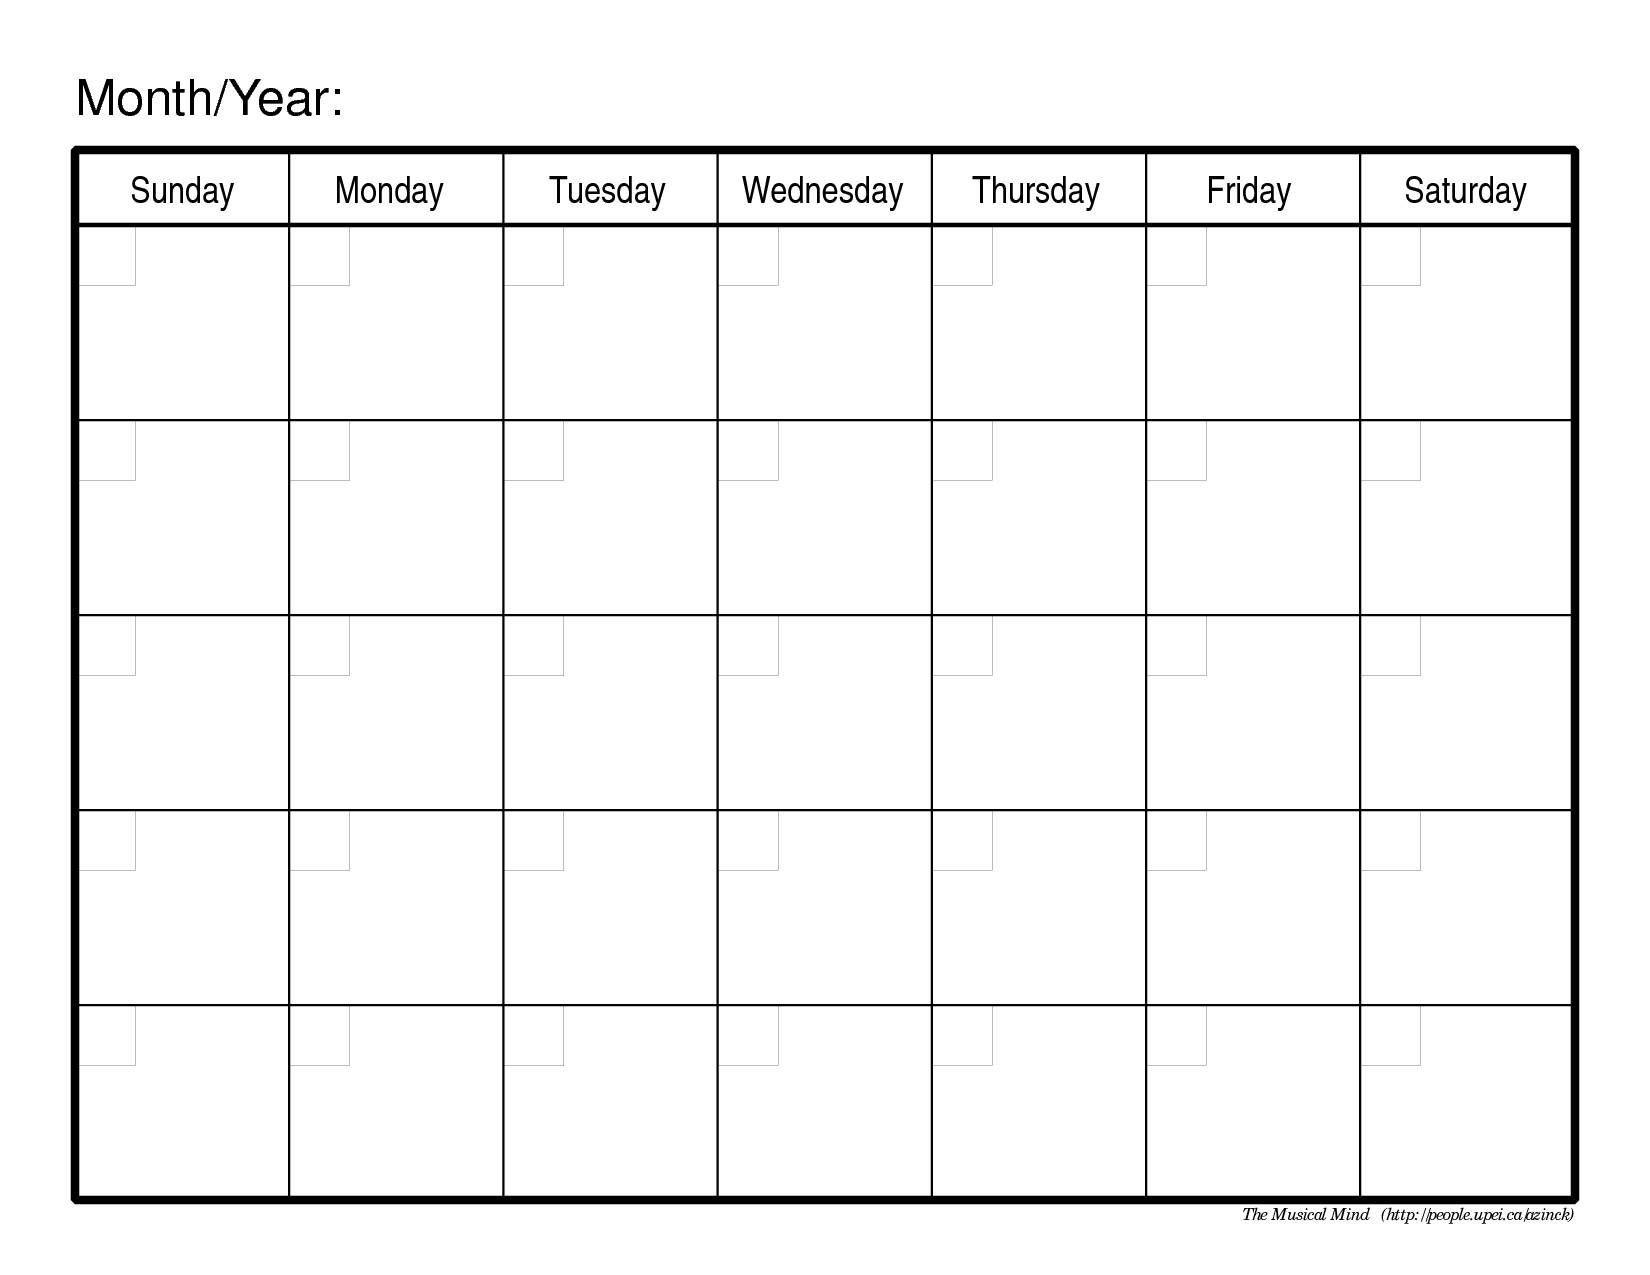 Monthly Calendar Free Printable | Printable Calendar 2014  Monthly Calendar Printable Full Page